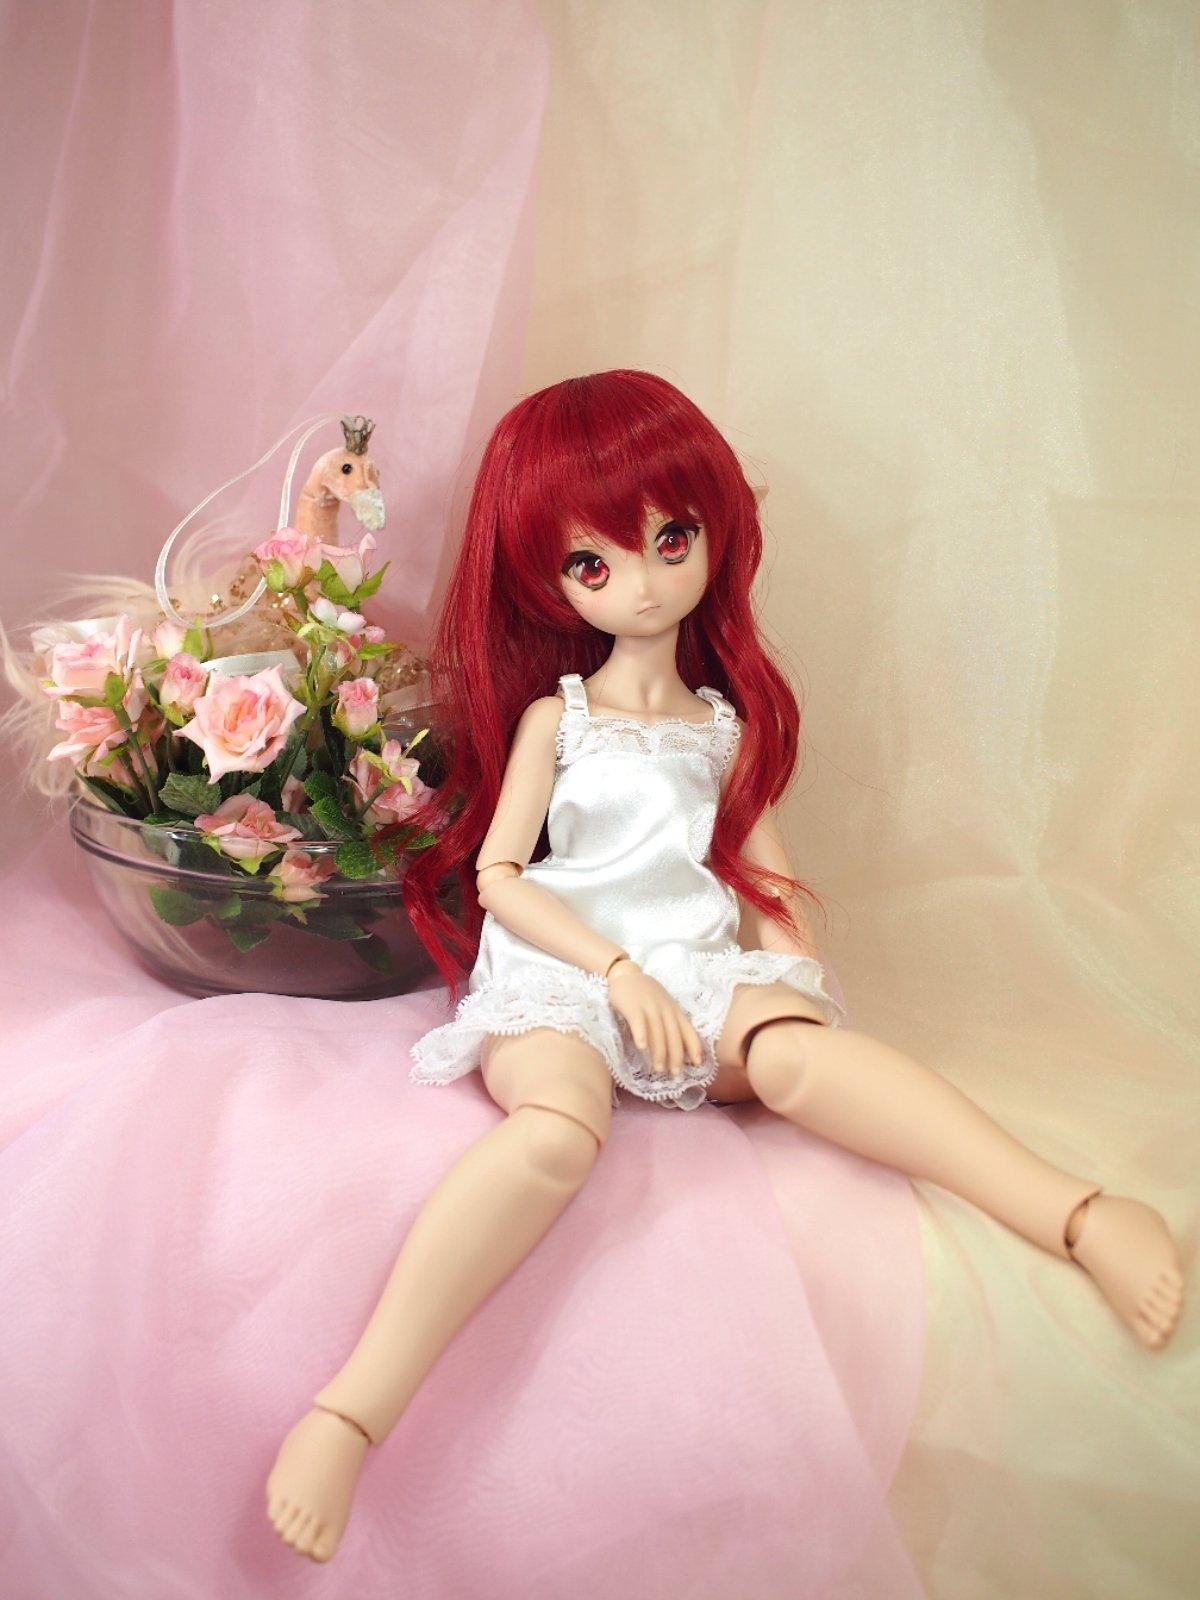 [Dollfie Dream] Corps MDD Mochi-Ashi - DCH-19 - DCH-21 - Page 3 Ebnj-v10